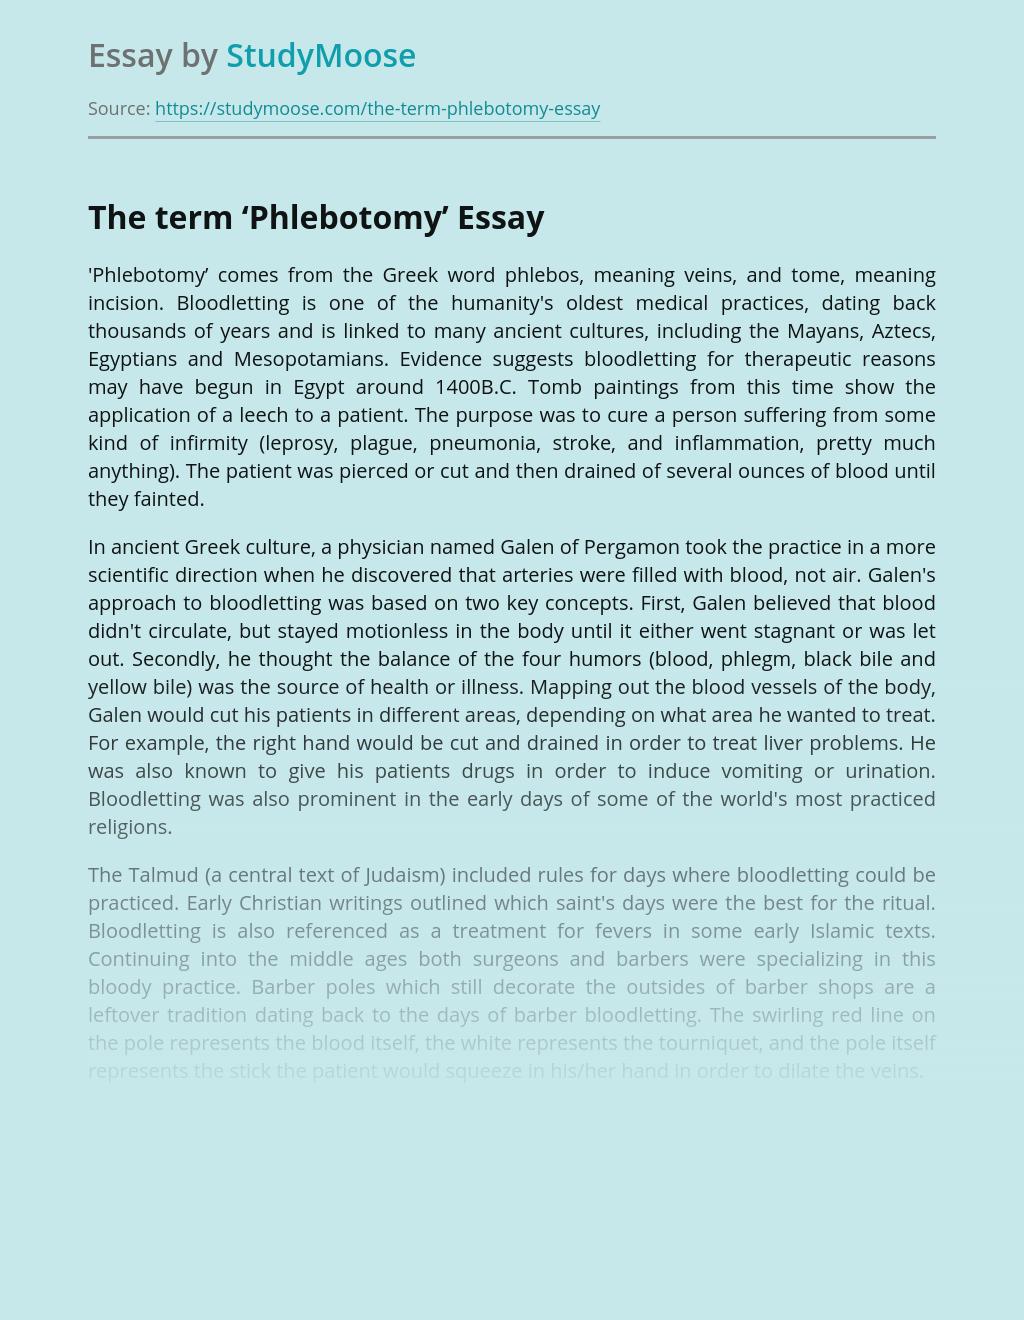 Phlebotomy in Preventive Health Care